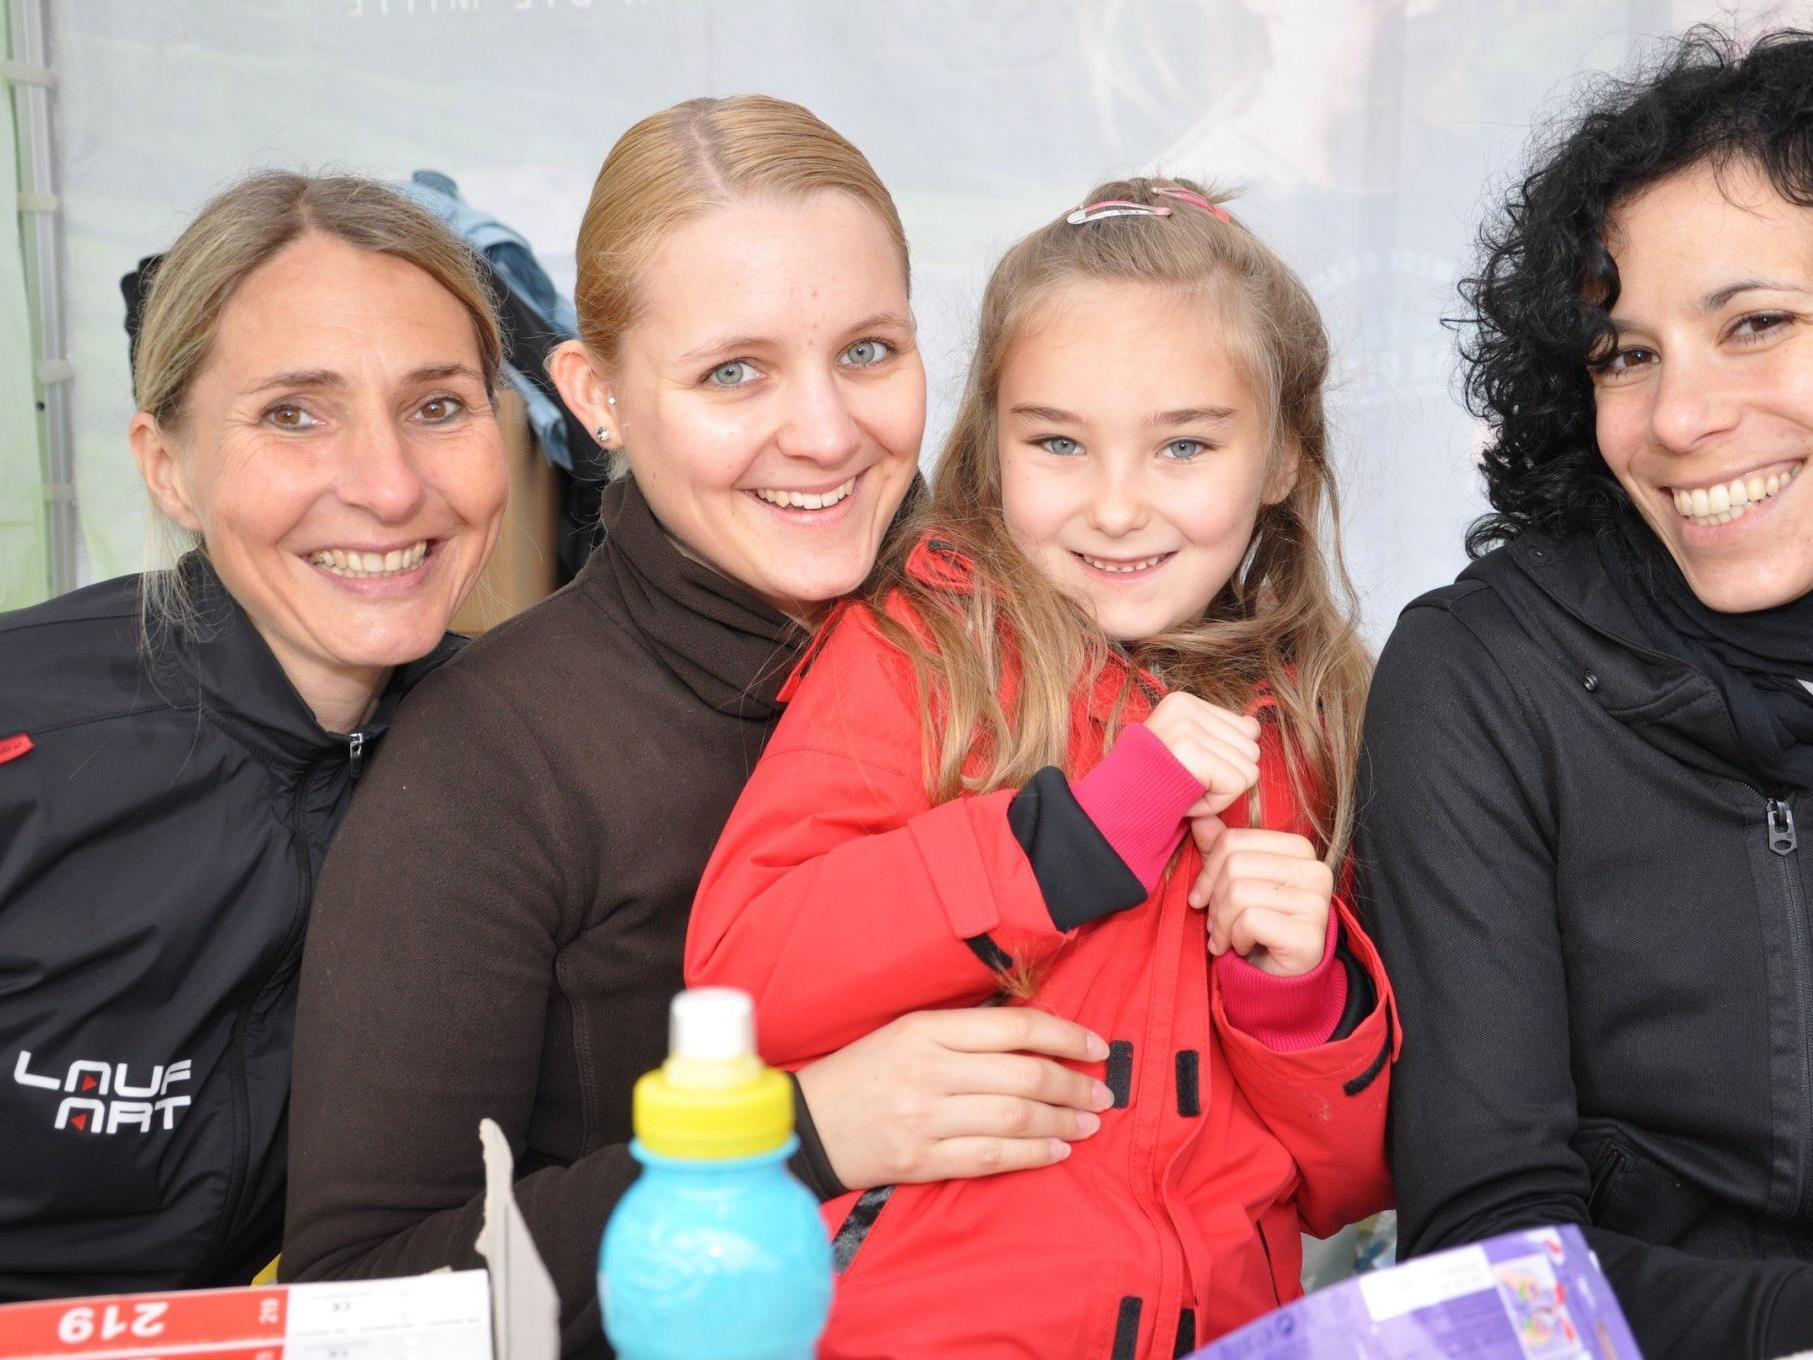 (v.l.) Sonja, Sandra, Sarah und Miriam.